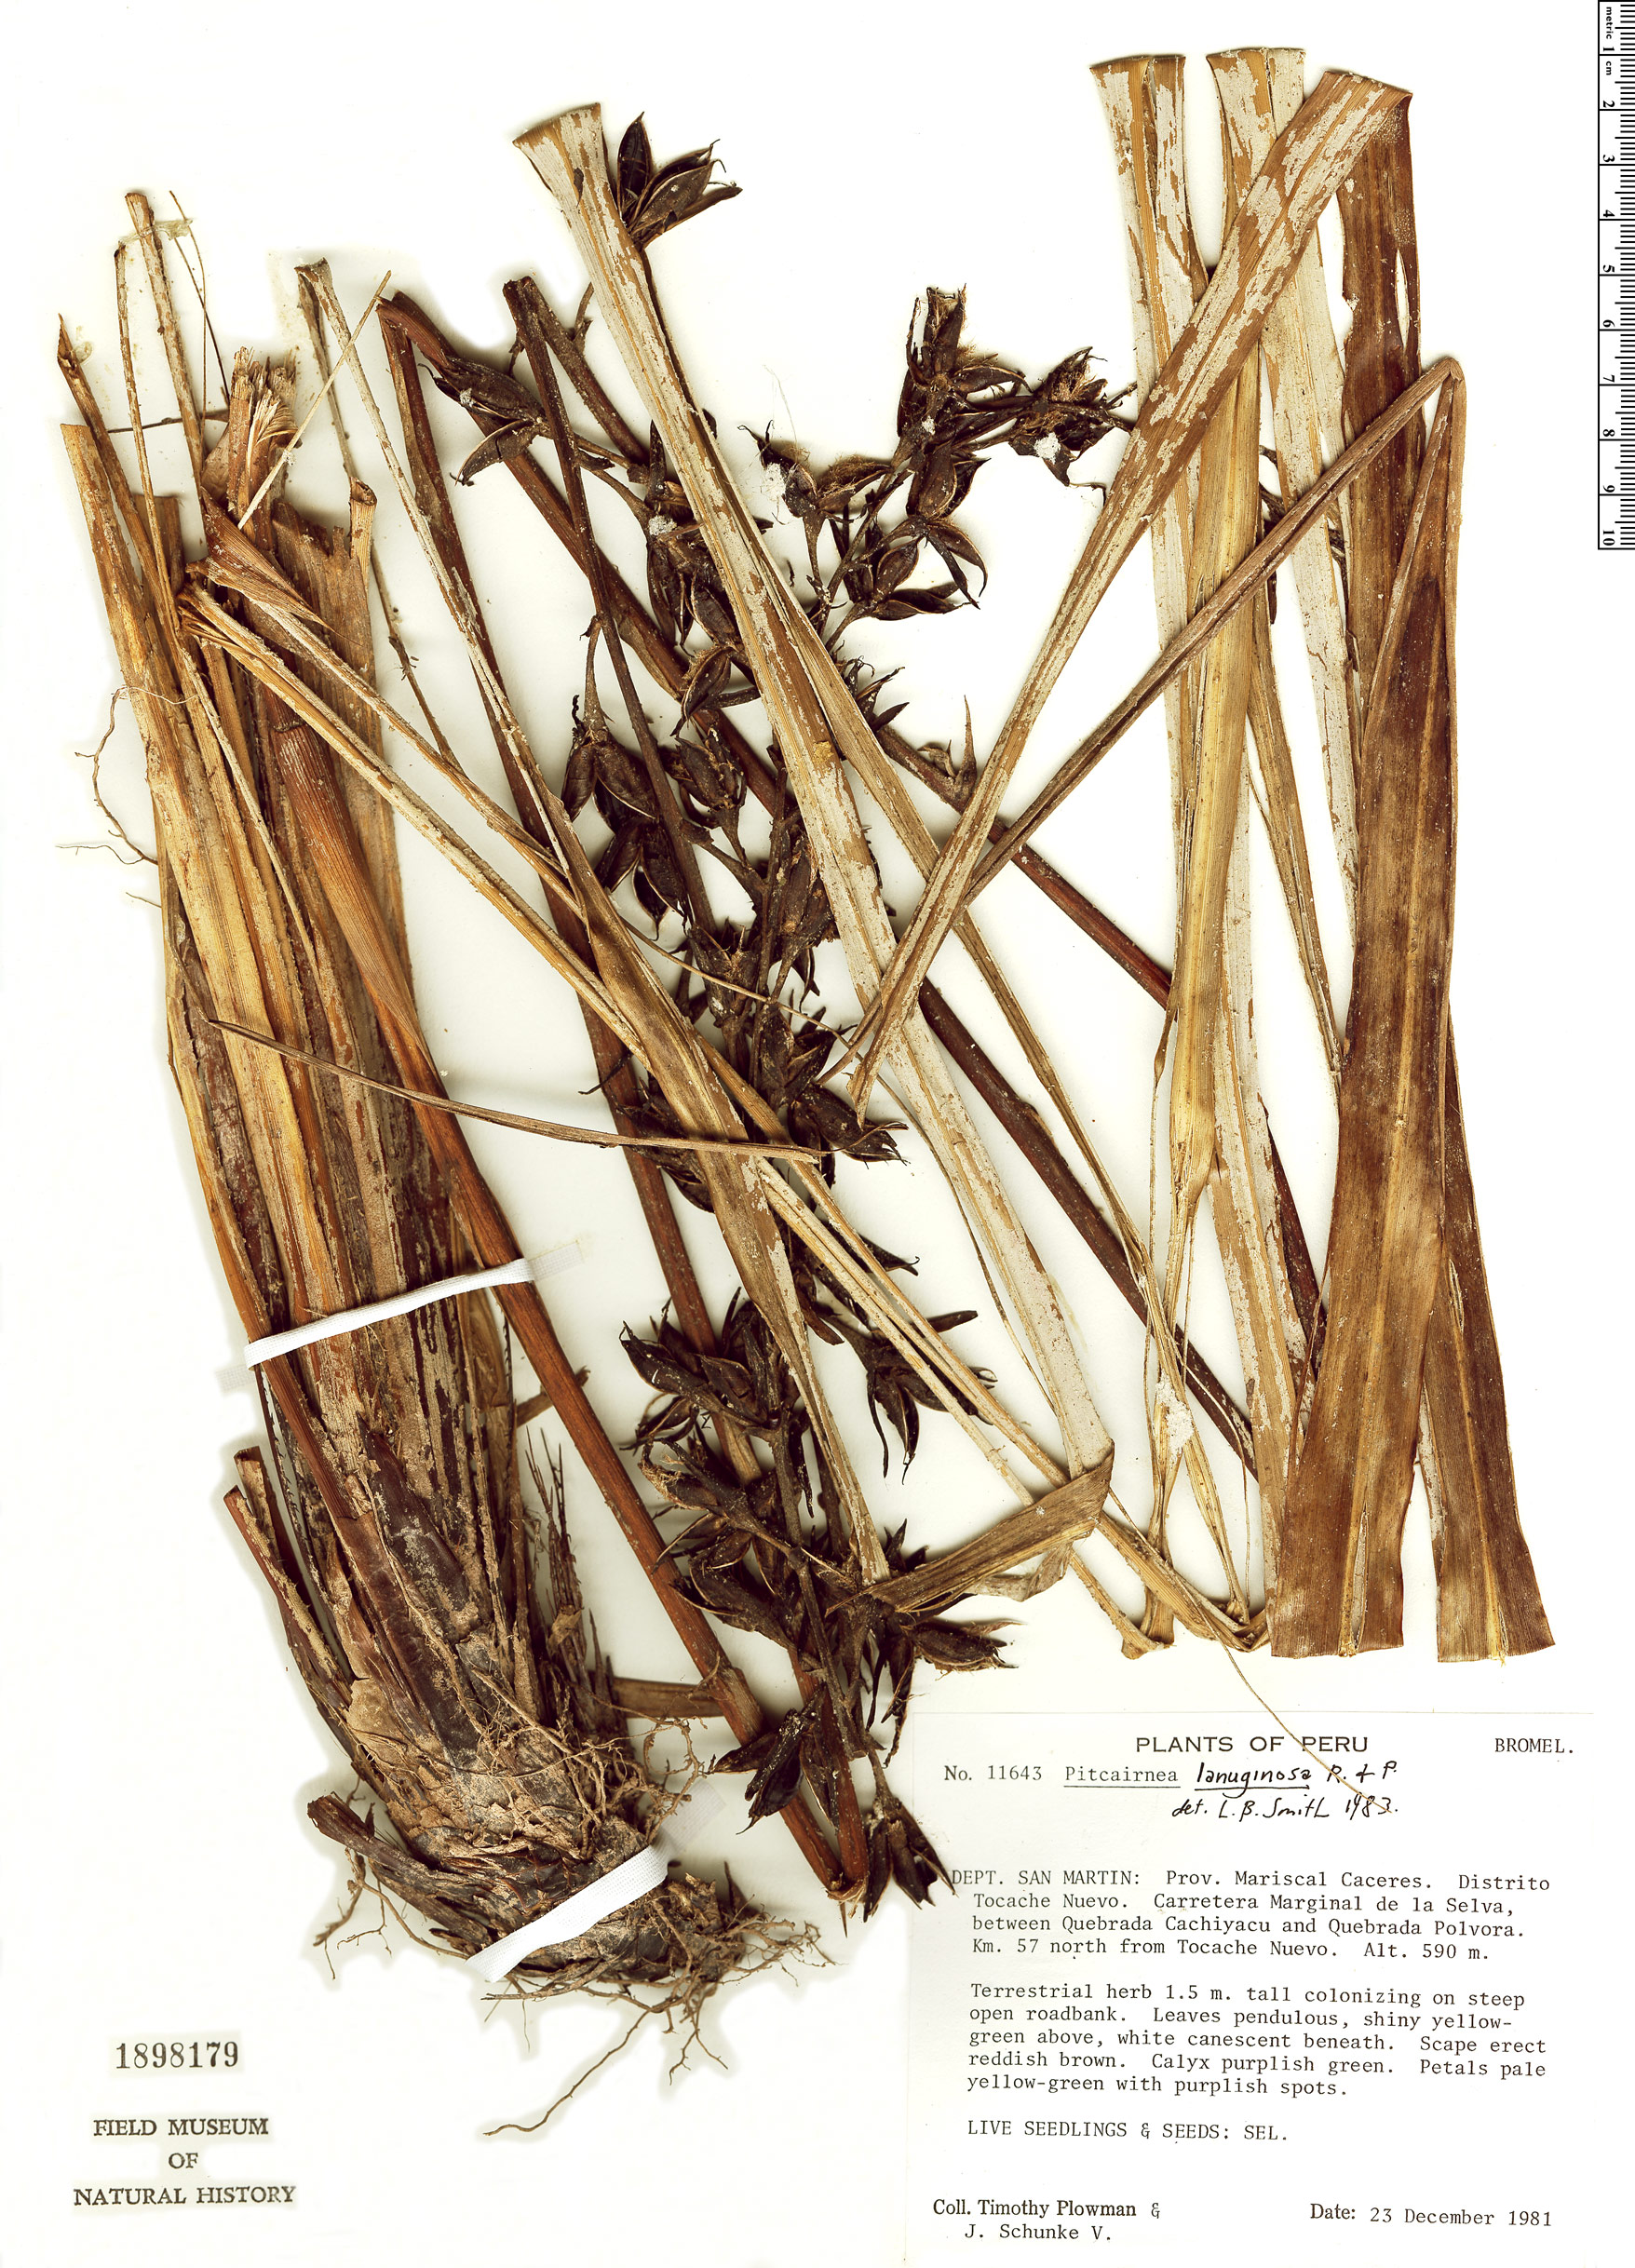 Specimen: Pitcairnia lanuginosa